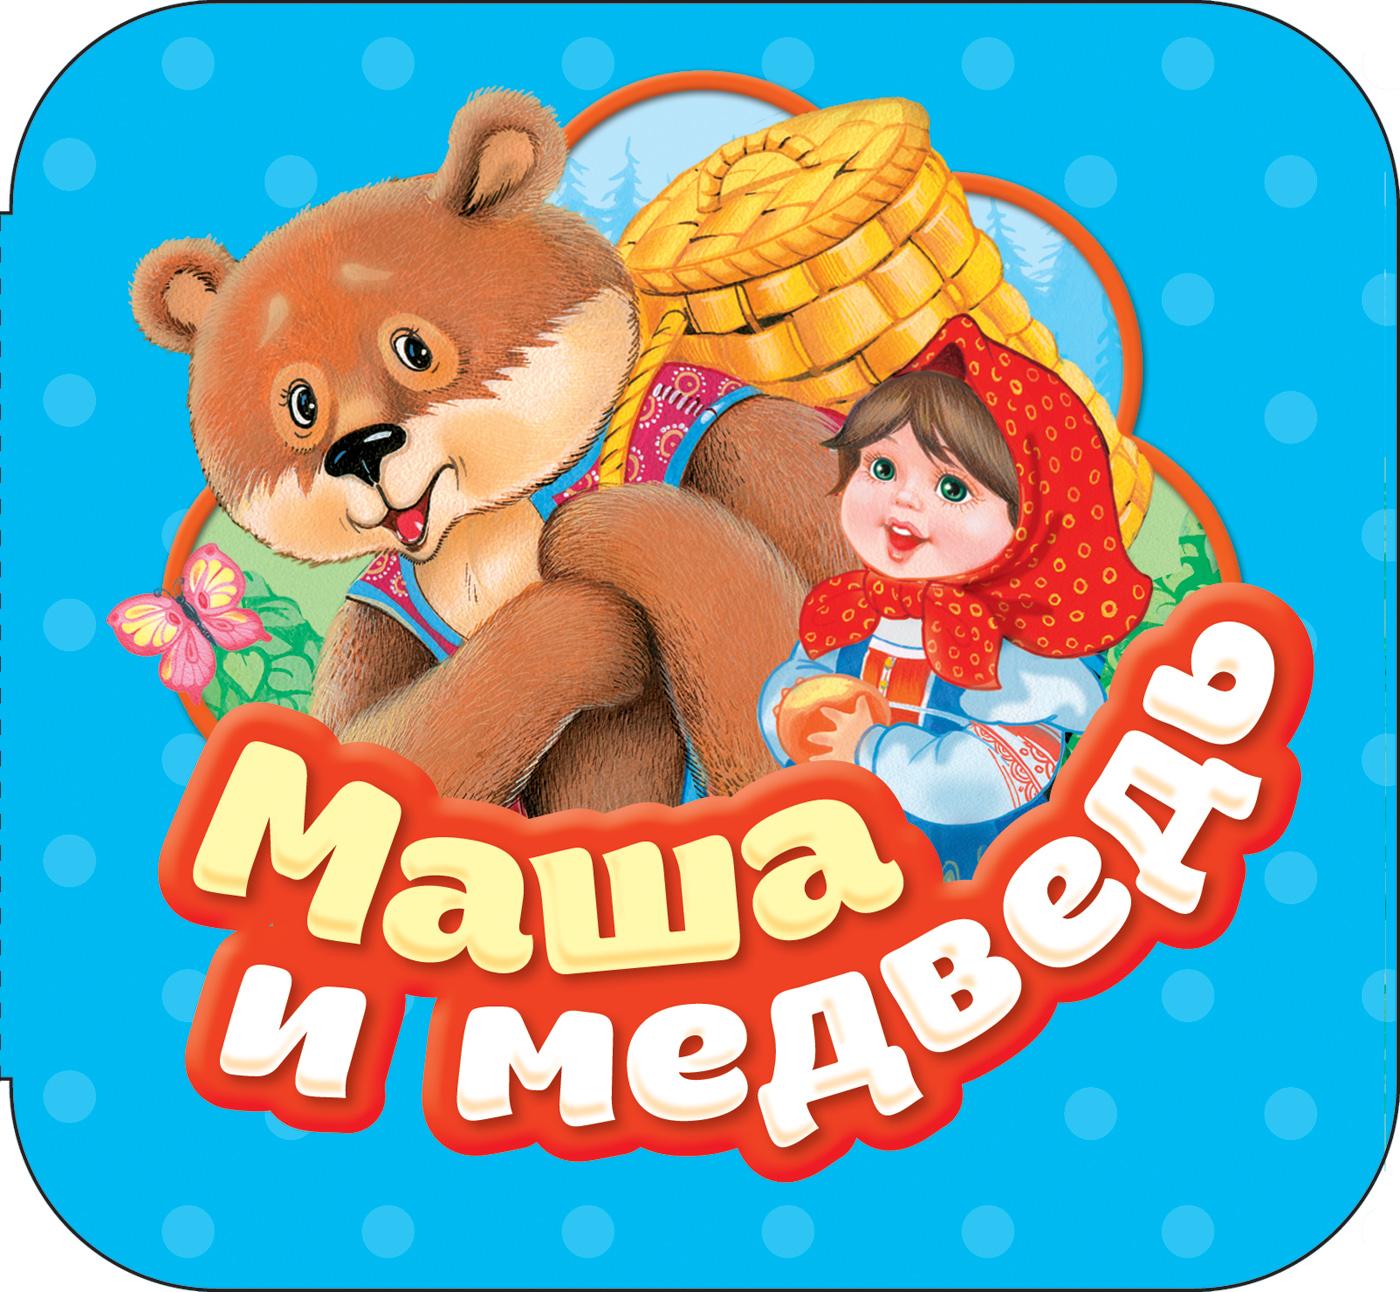 Булатов М. А. Маша и медведь (Гармошки) булатов м а маша и медведь панорамка